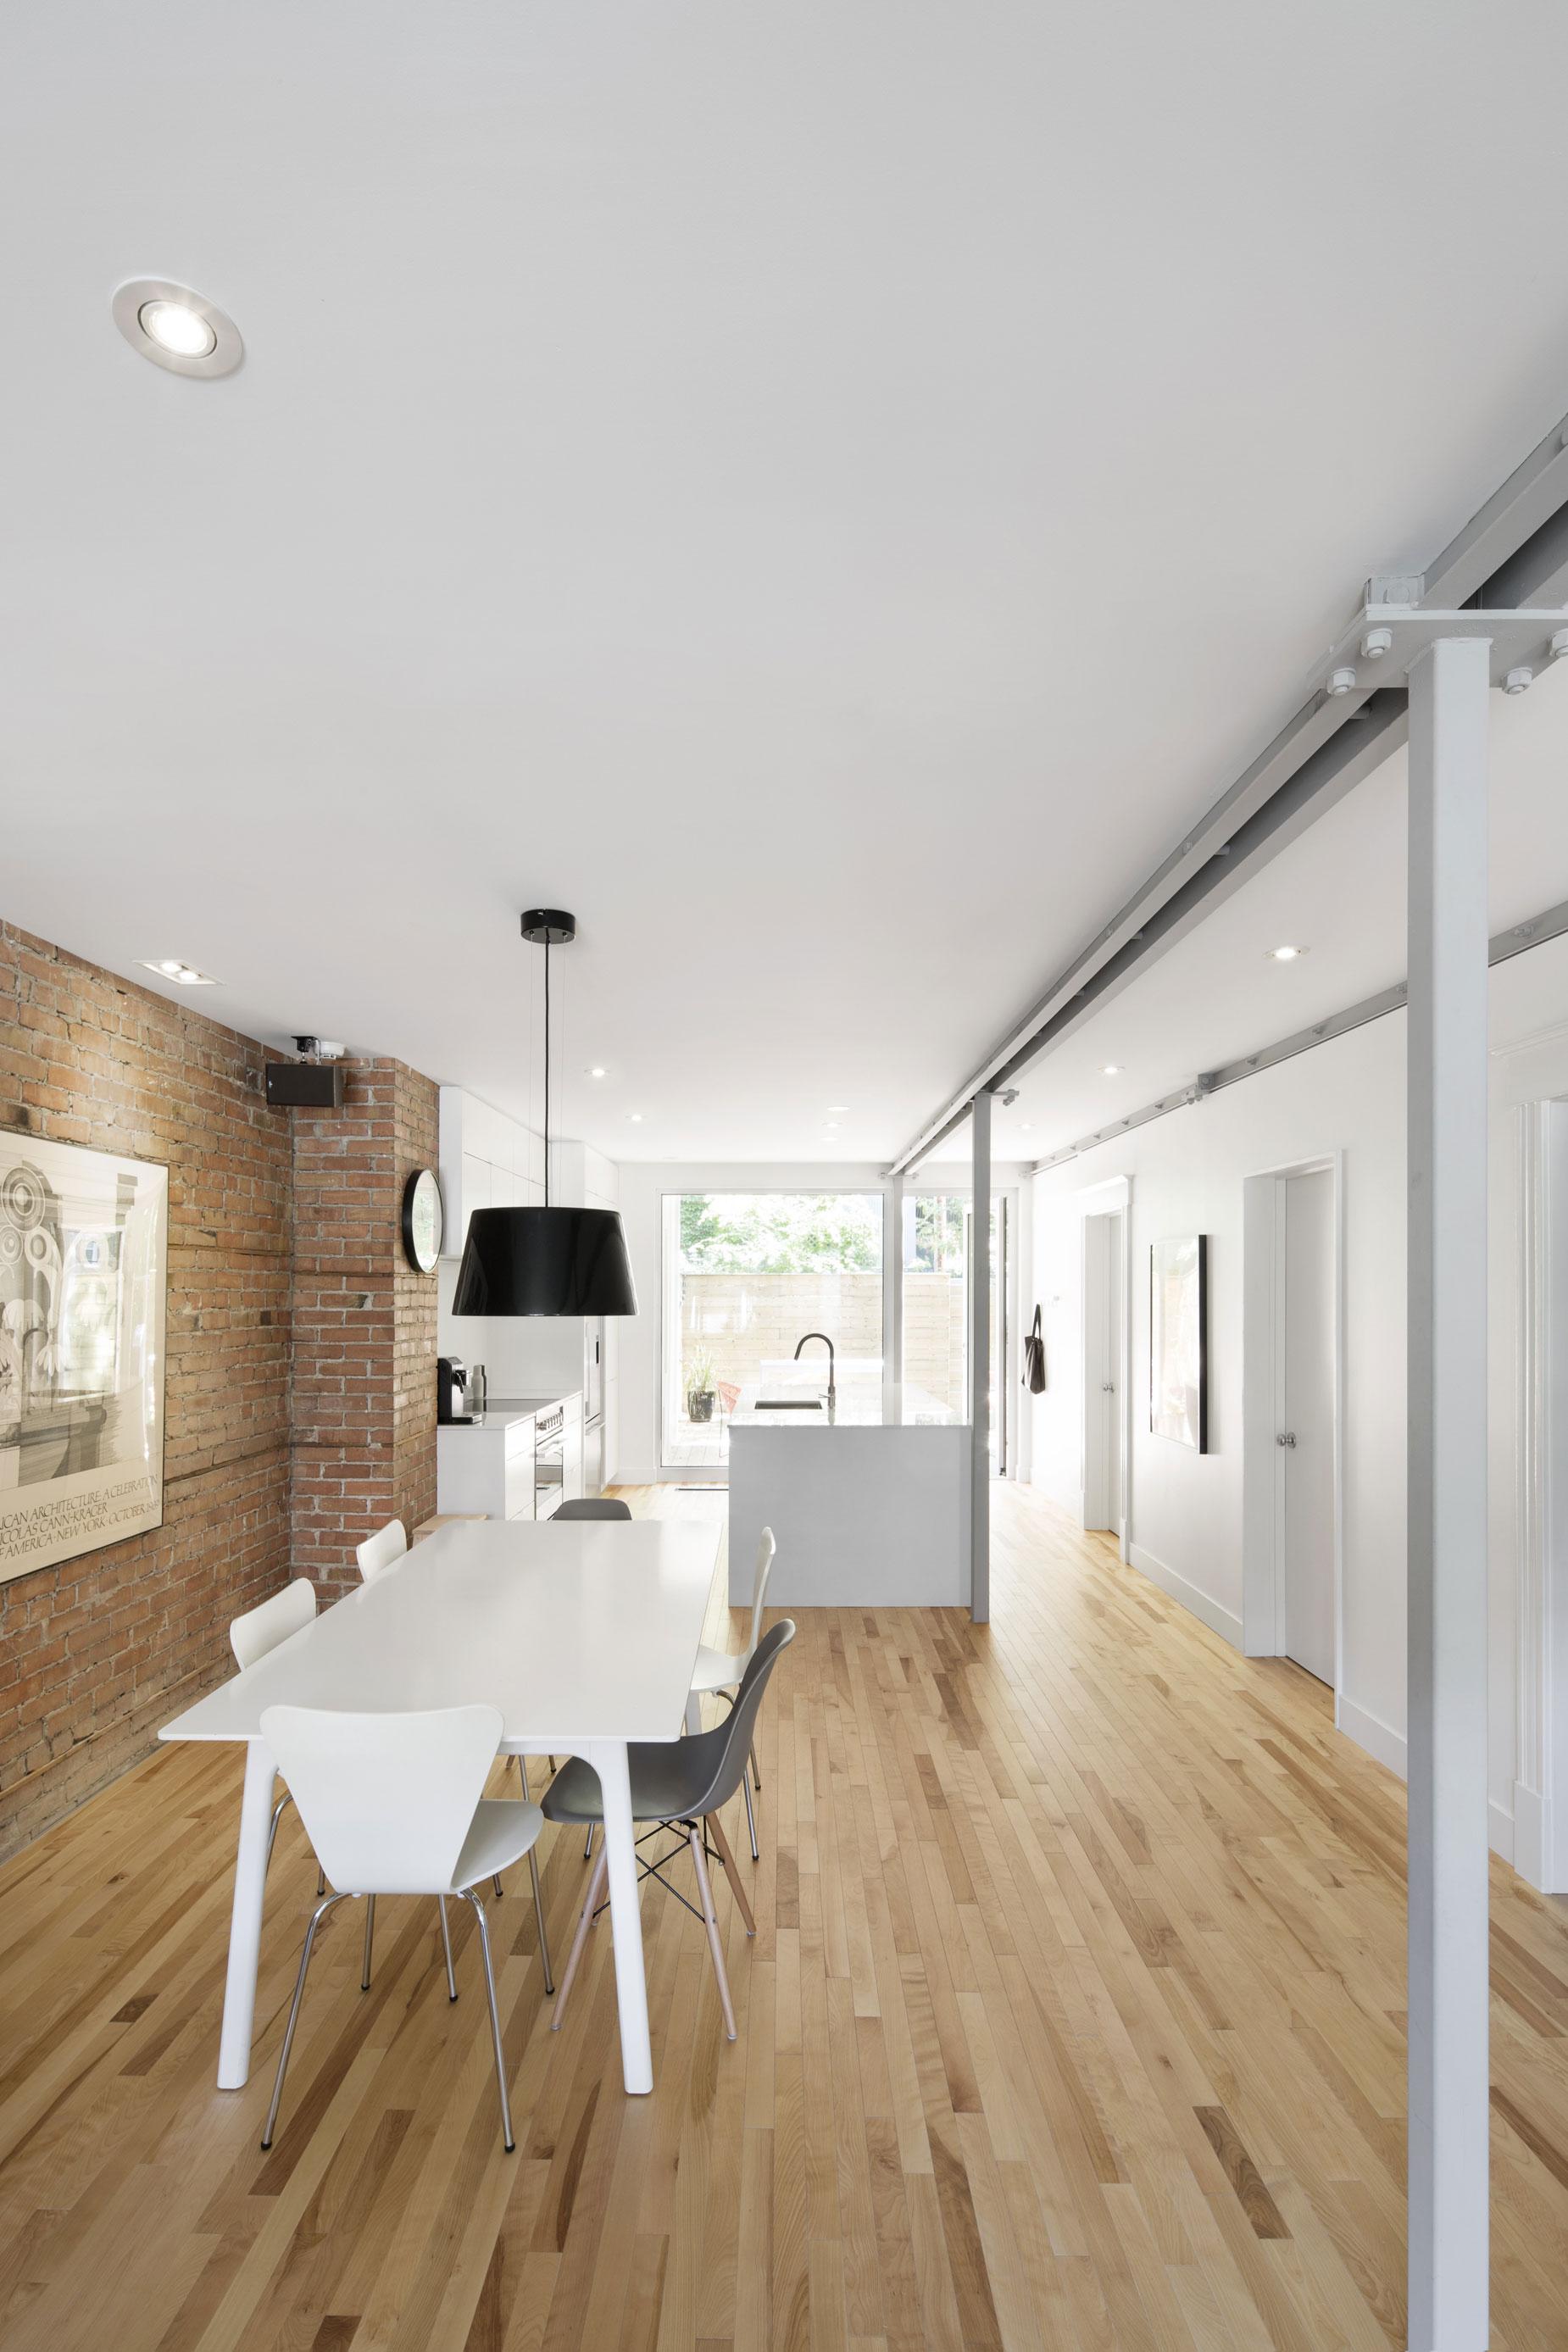 867 De Bougainville Apartment by Bourgeois:Lechasseur architects-06